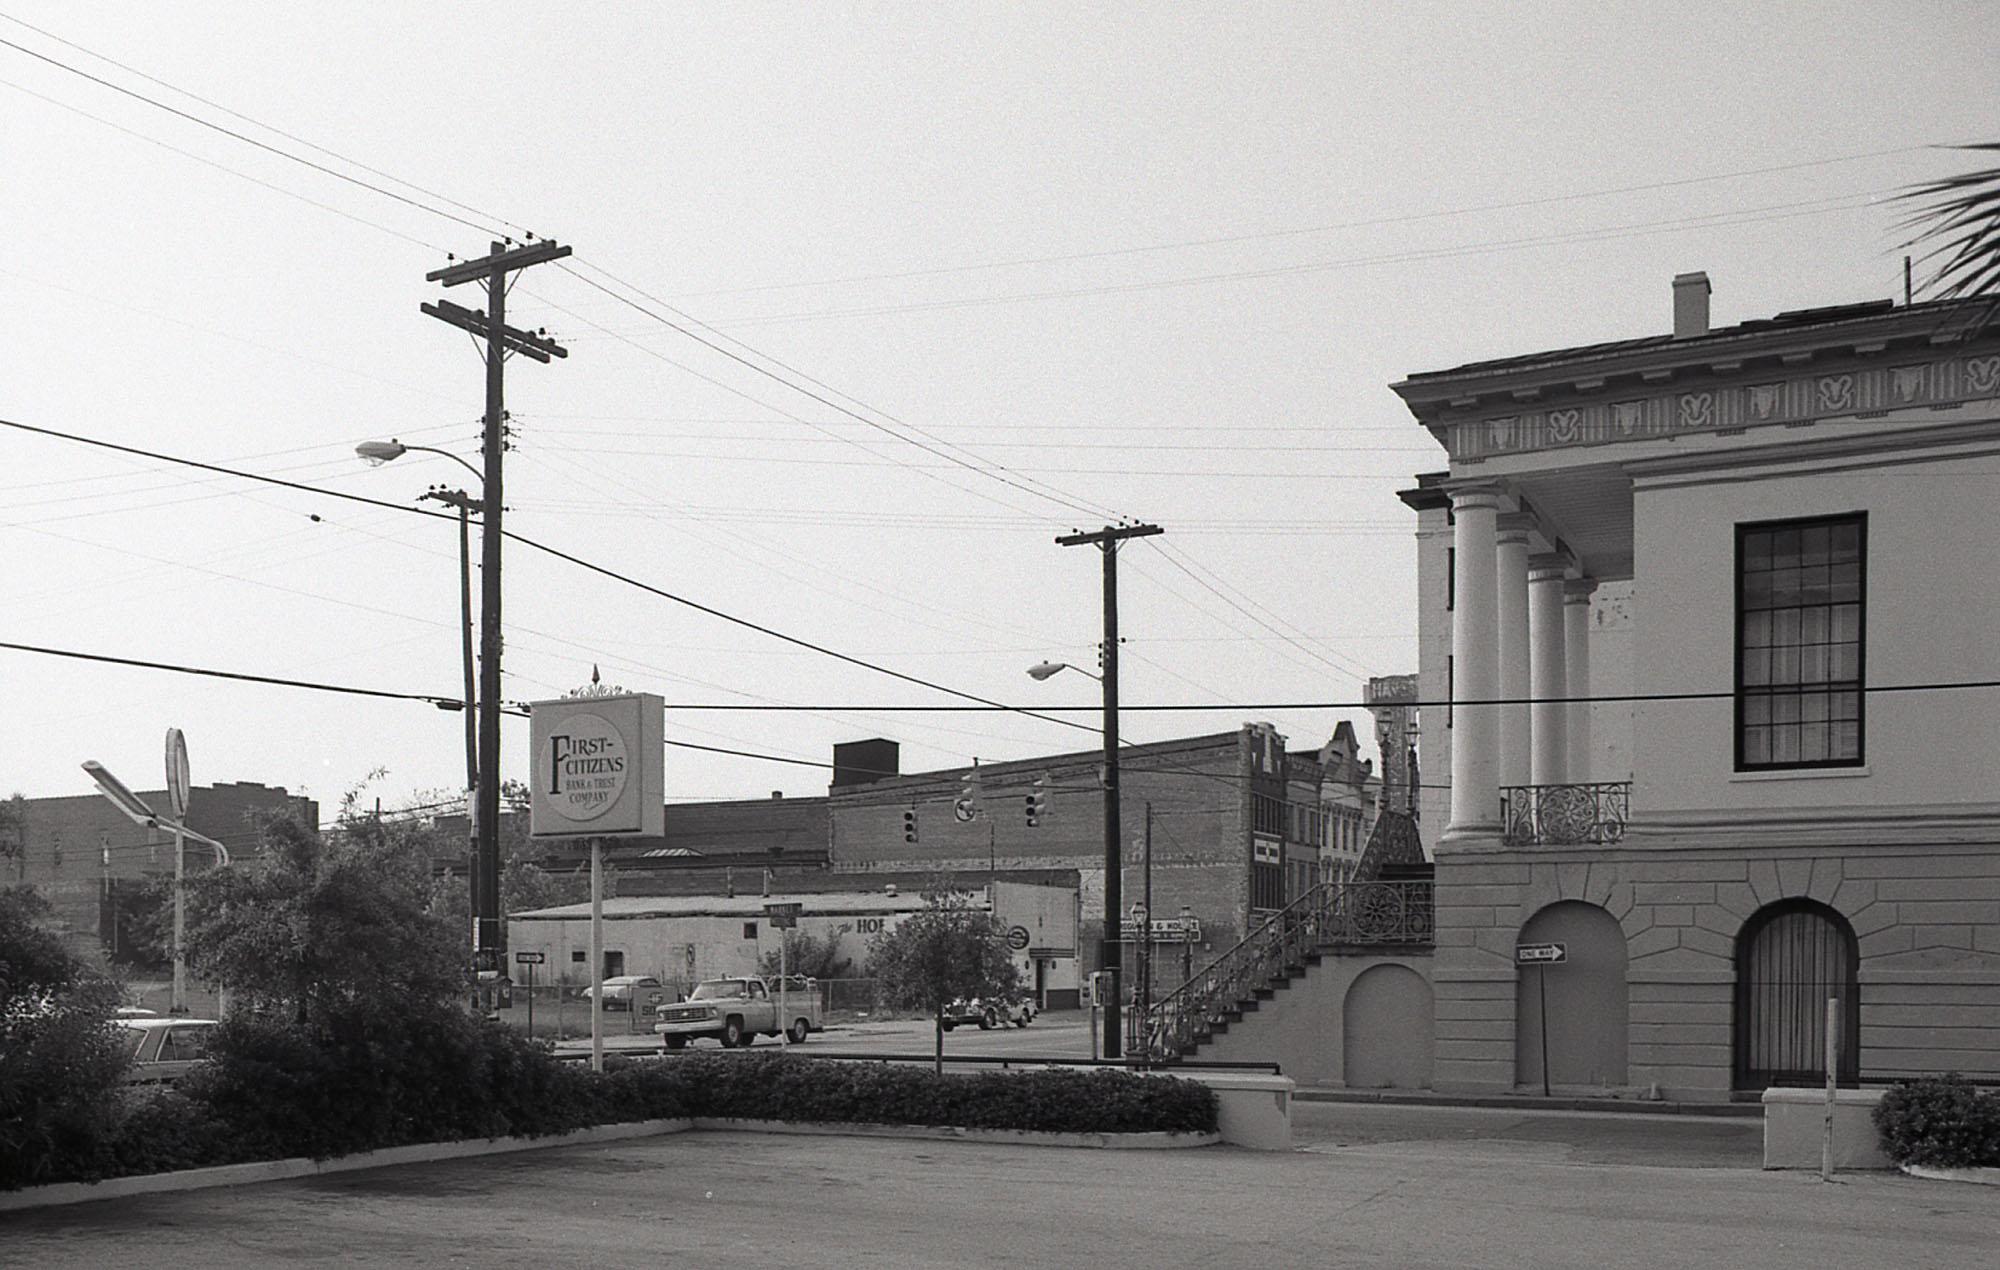 Photographic Survey: Charleston Center Site 24